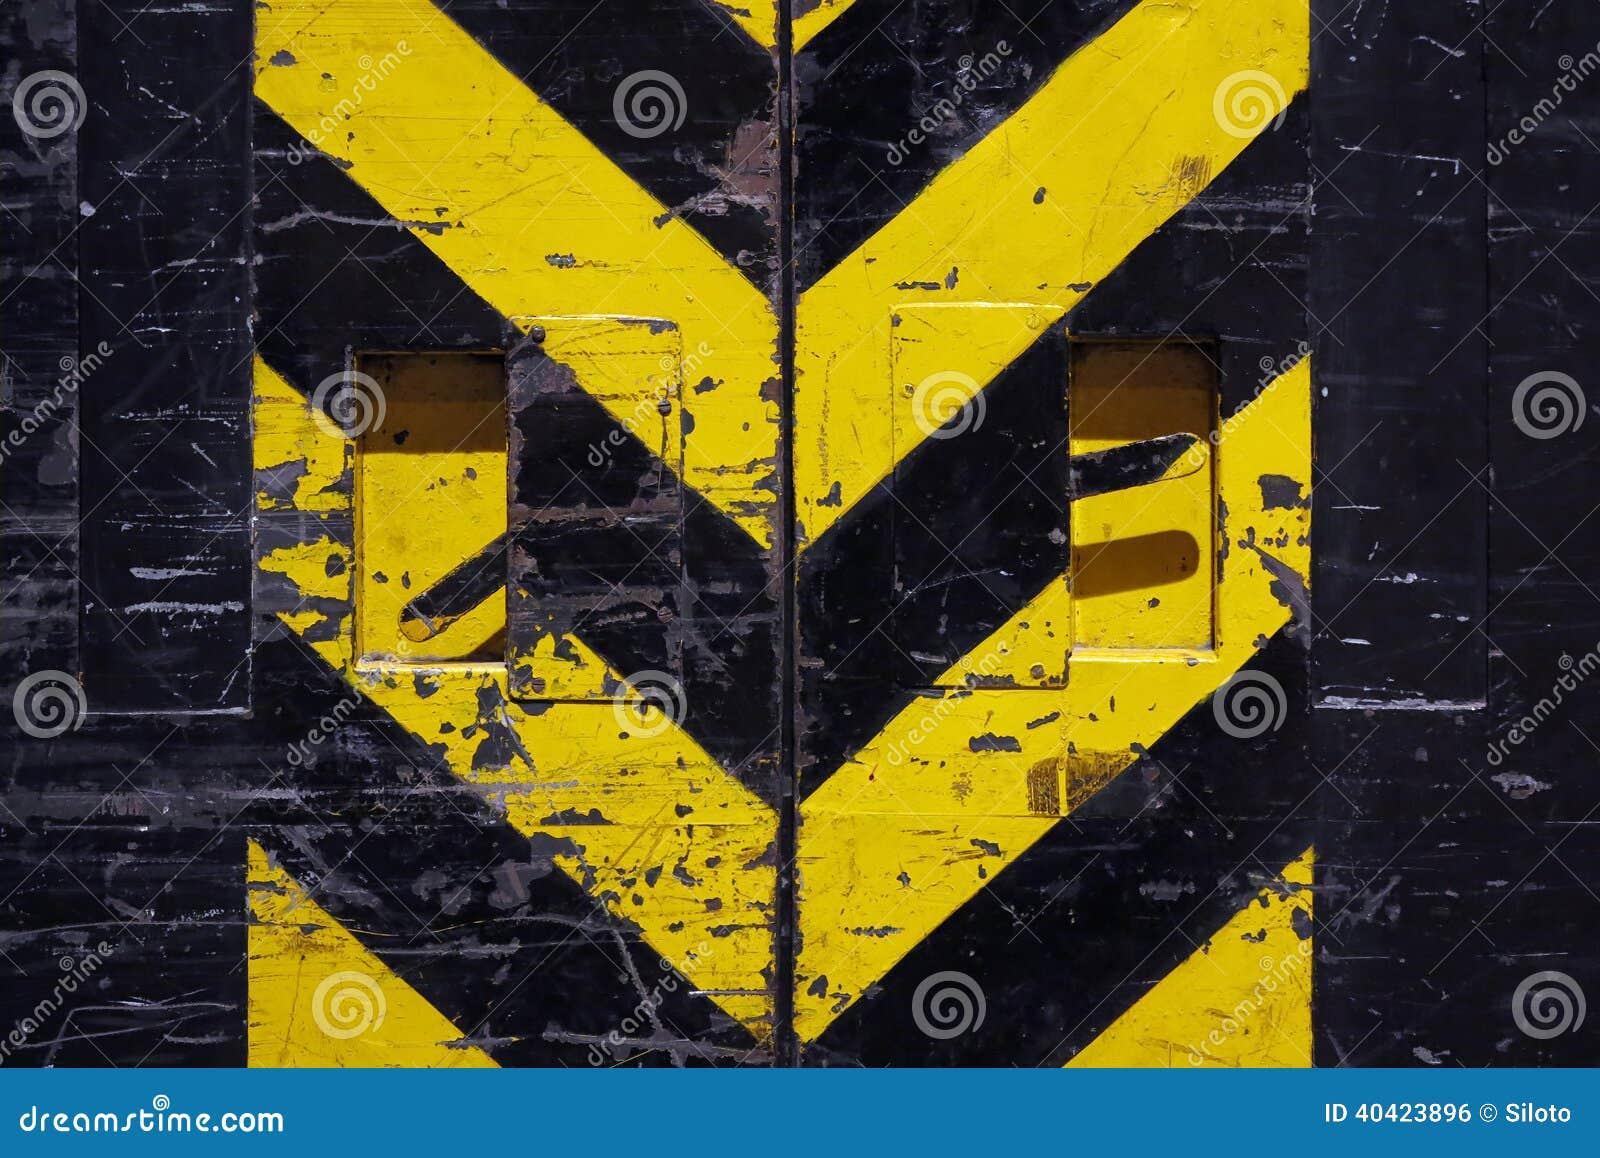 grunge door yellow and black stripes stock photo image of alert